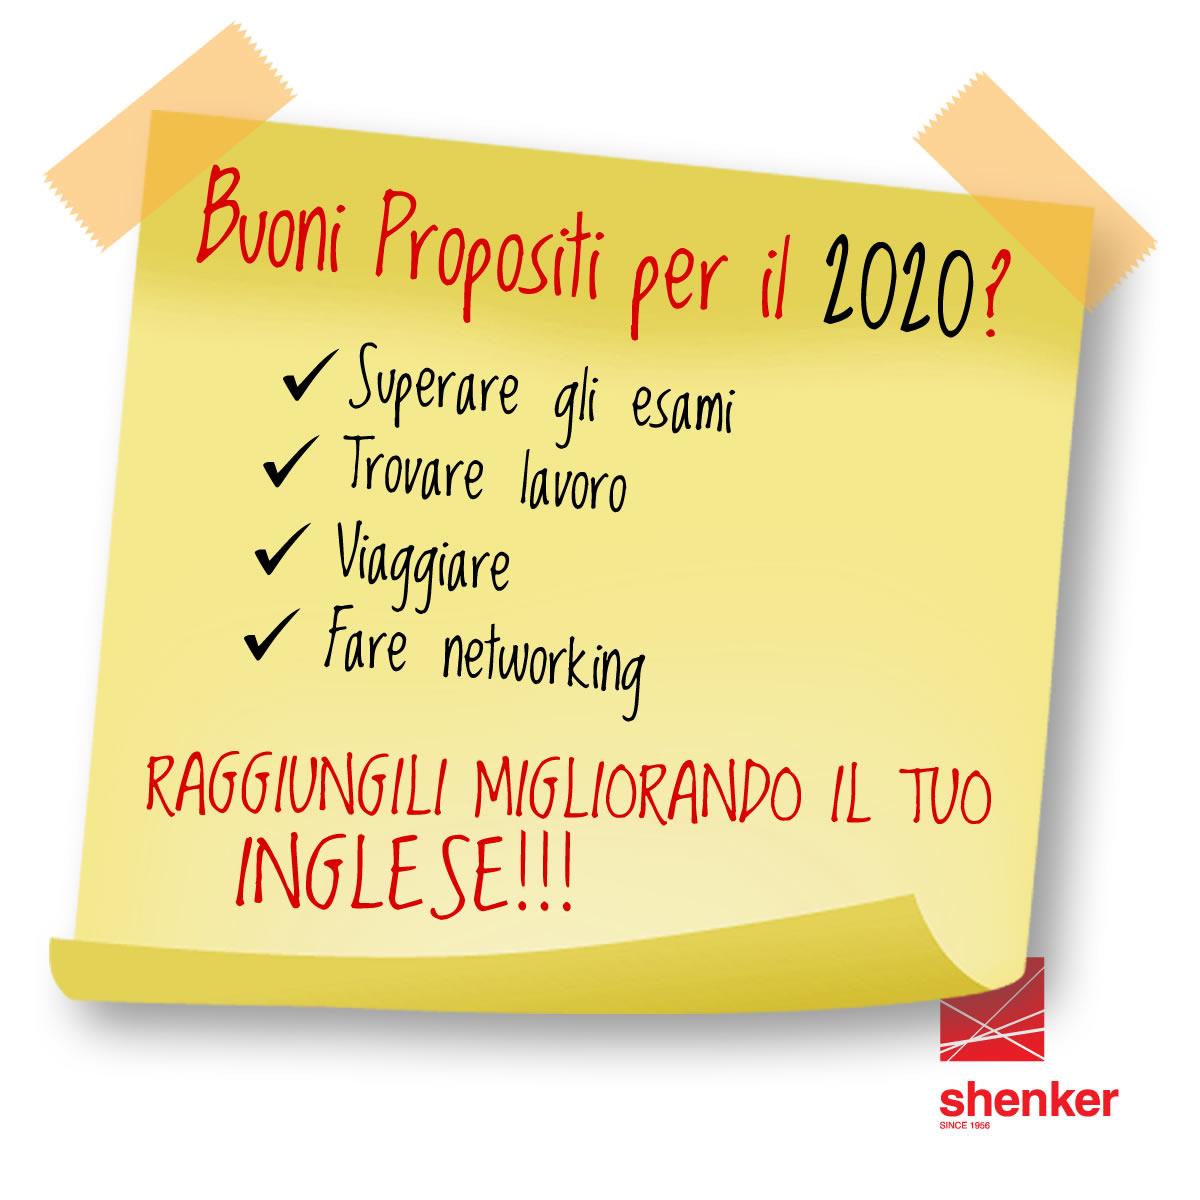 Shenker buoni propositi 2020